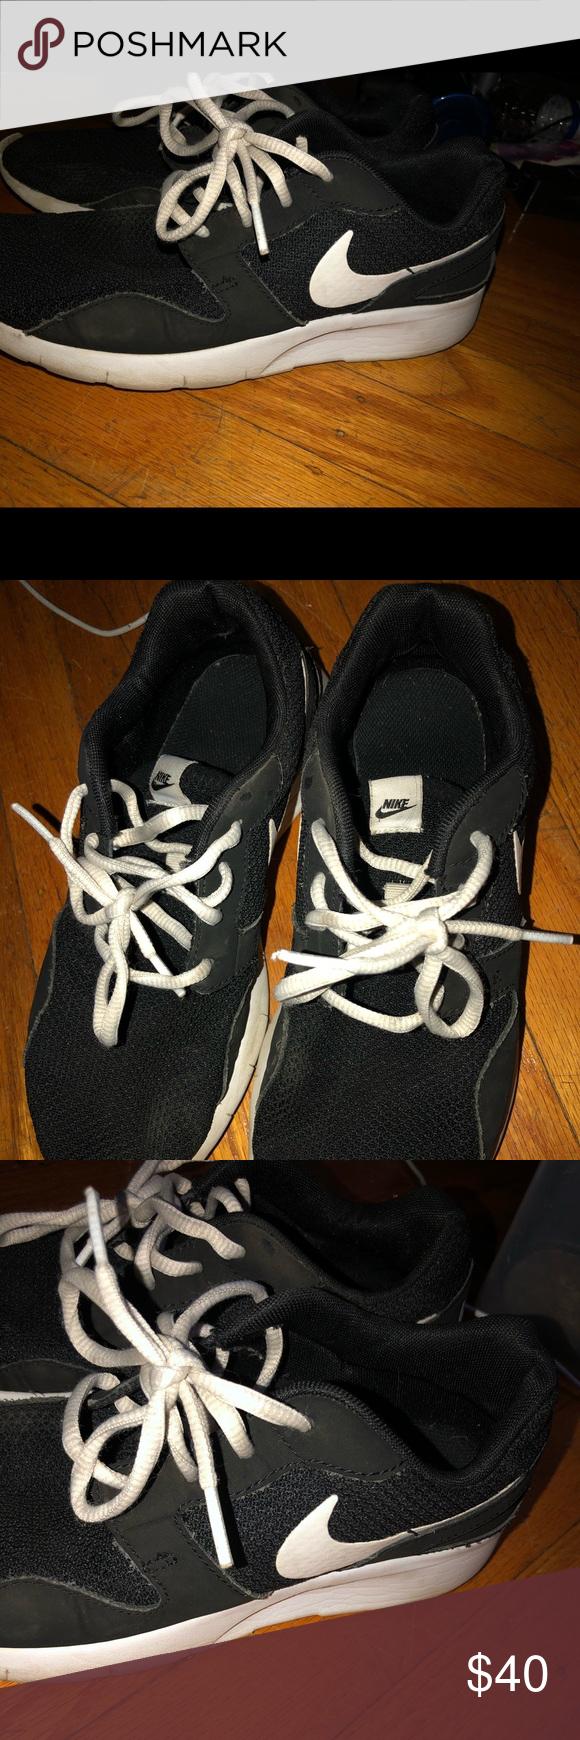 Boys Nike Roches Sneakers Bots Nike Sneakers! Definitely got a lot of wear out o…